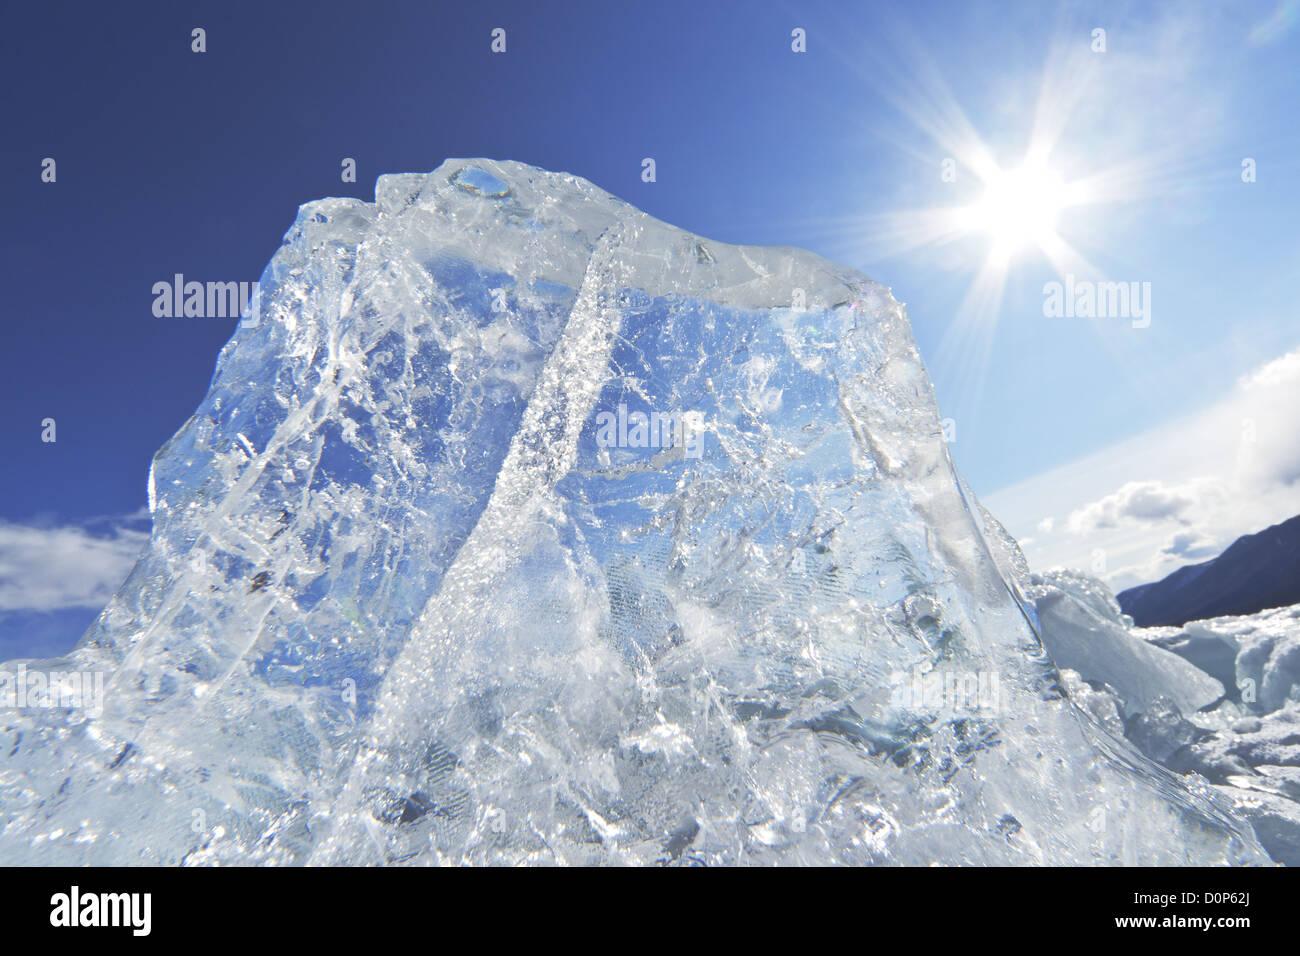 Piece of ice and the sun on winter Lake Baikal - Stock Image